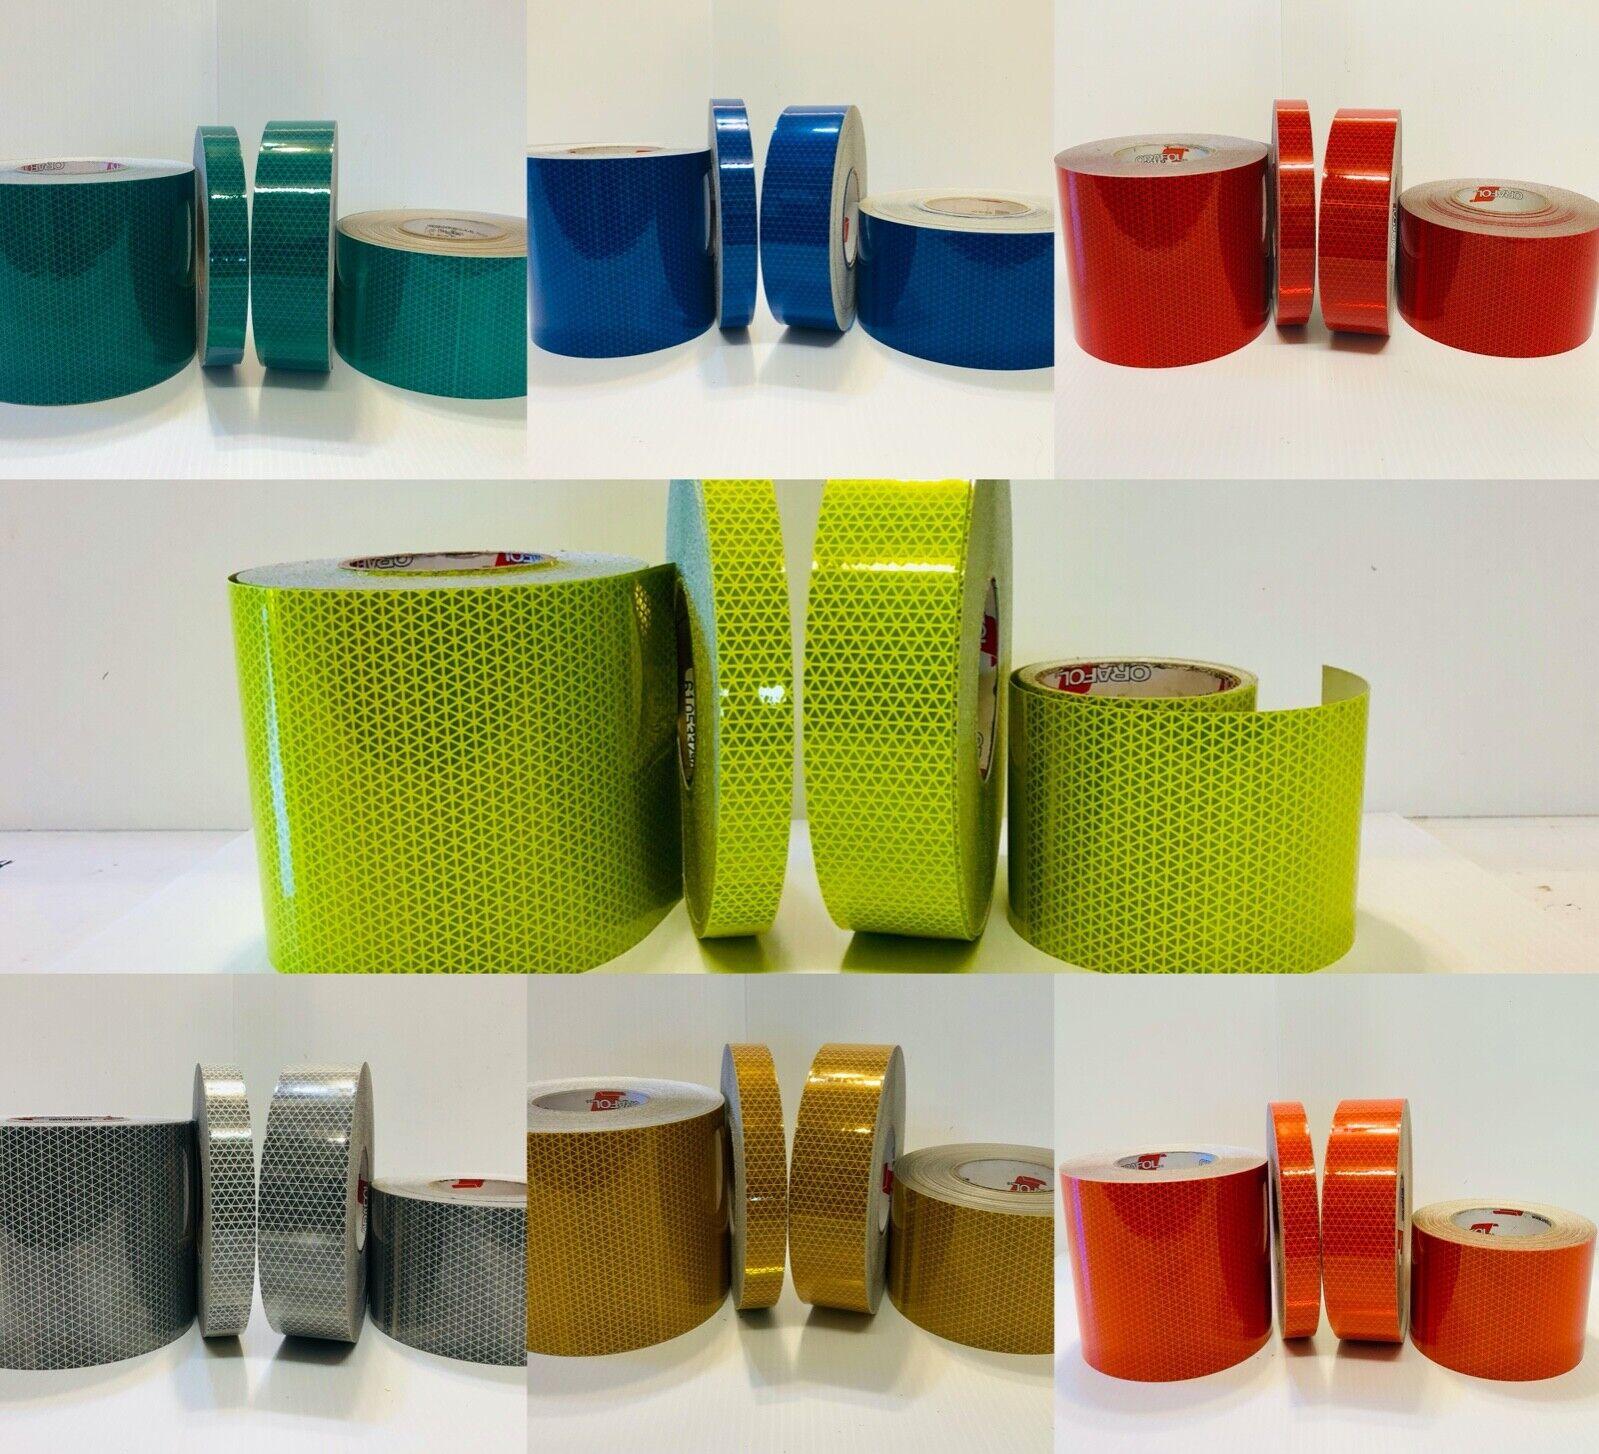 v98 reflective tape orafol 7 colors 1